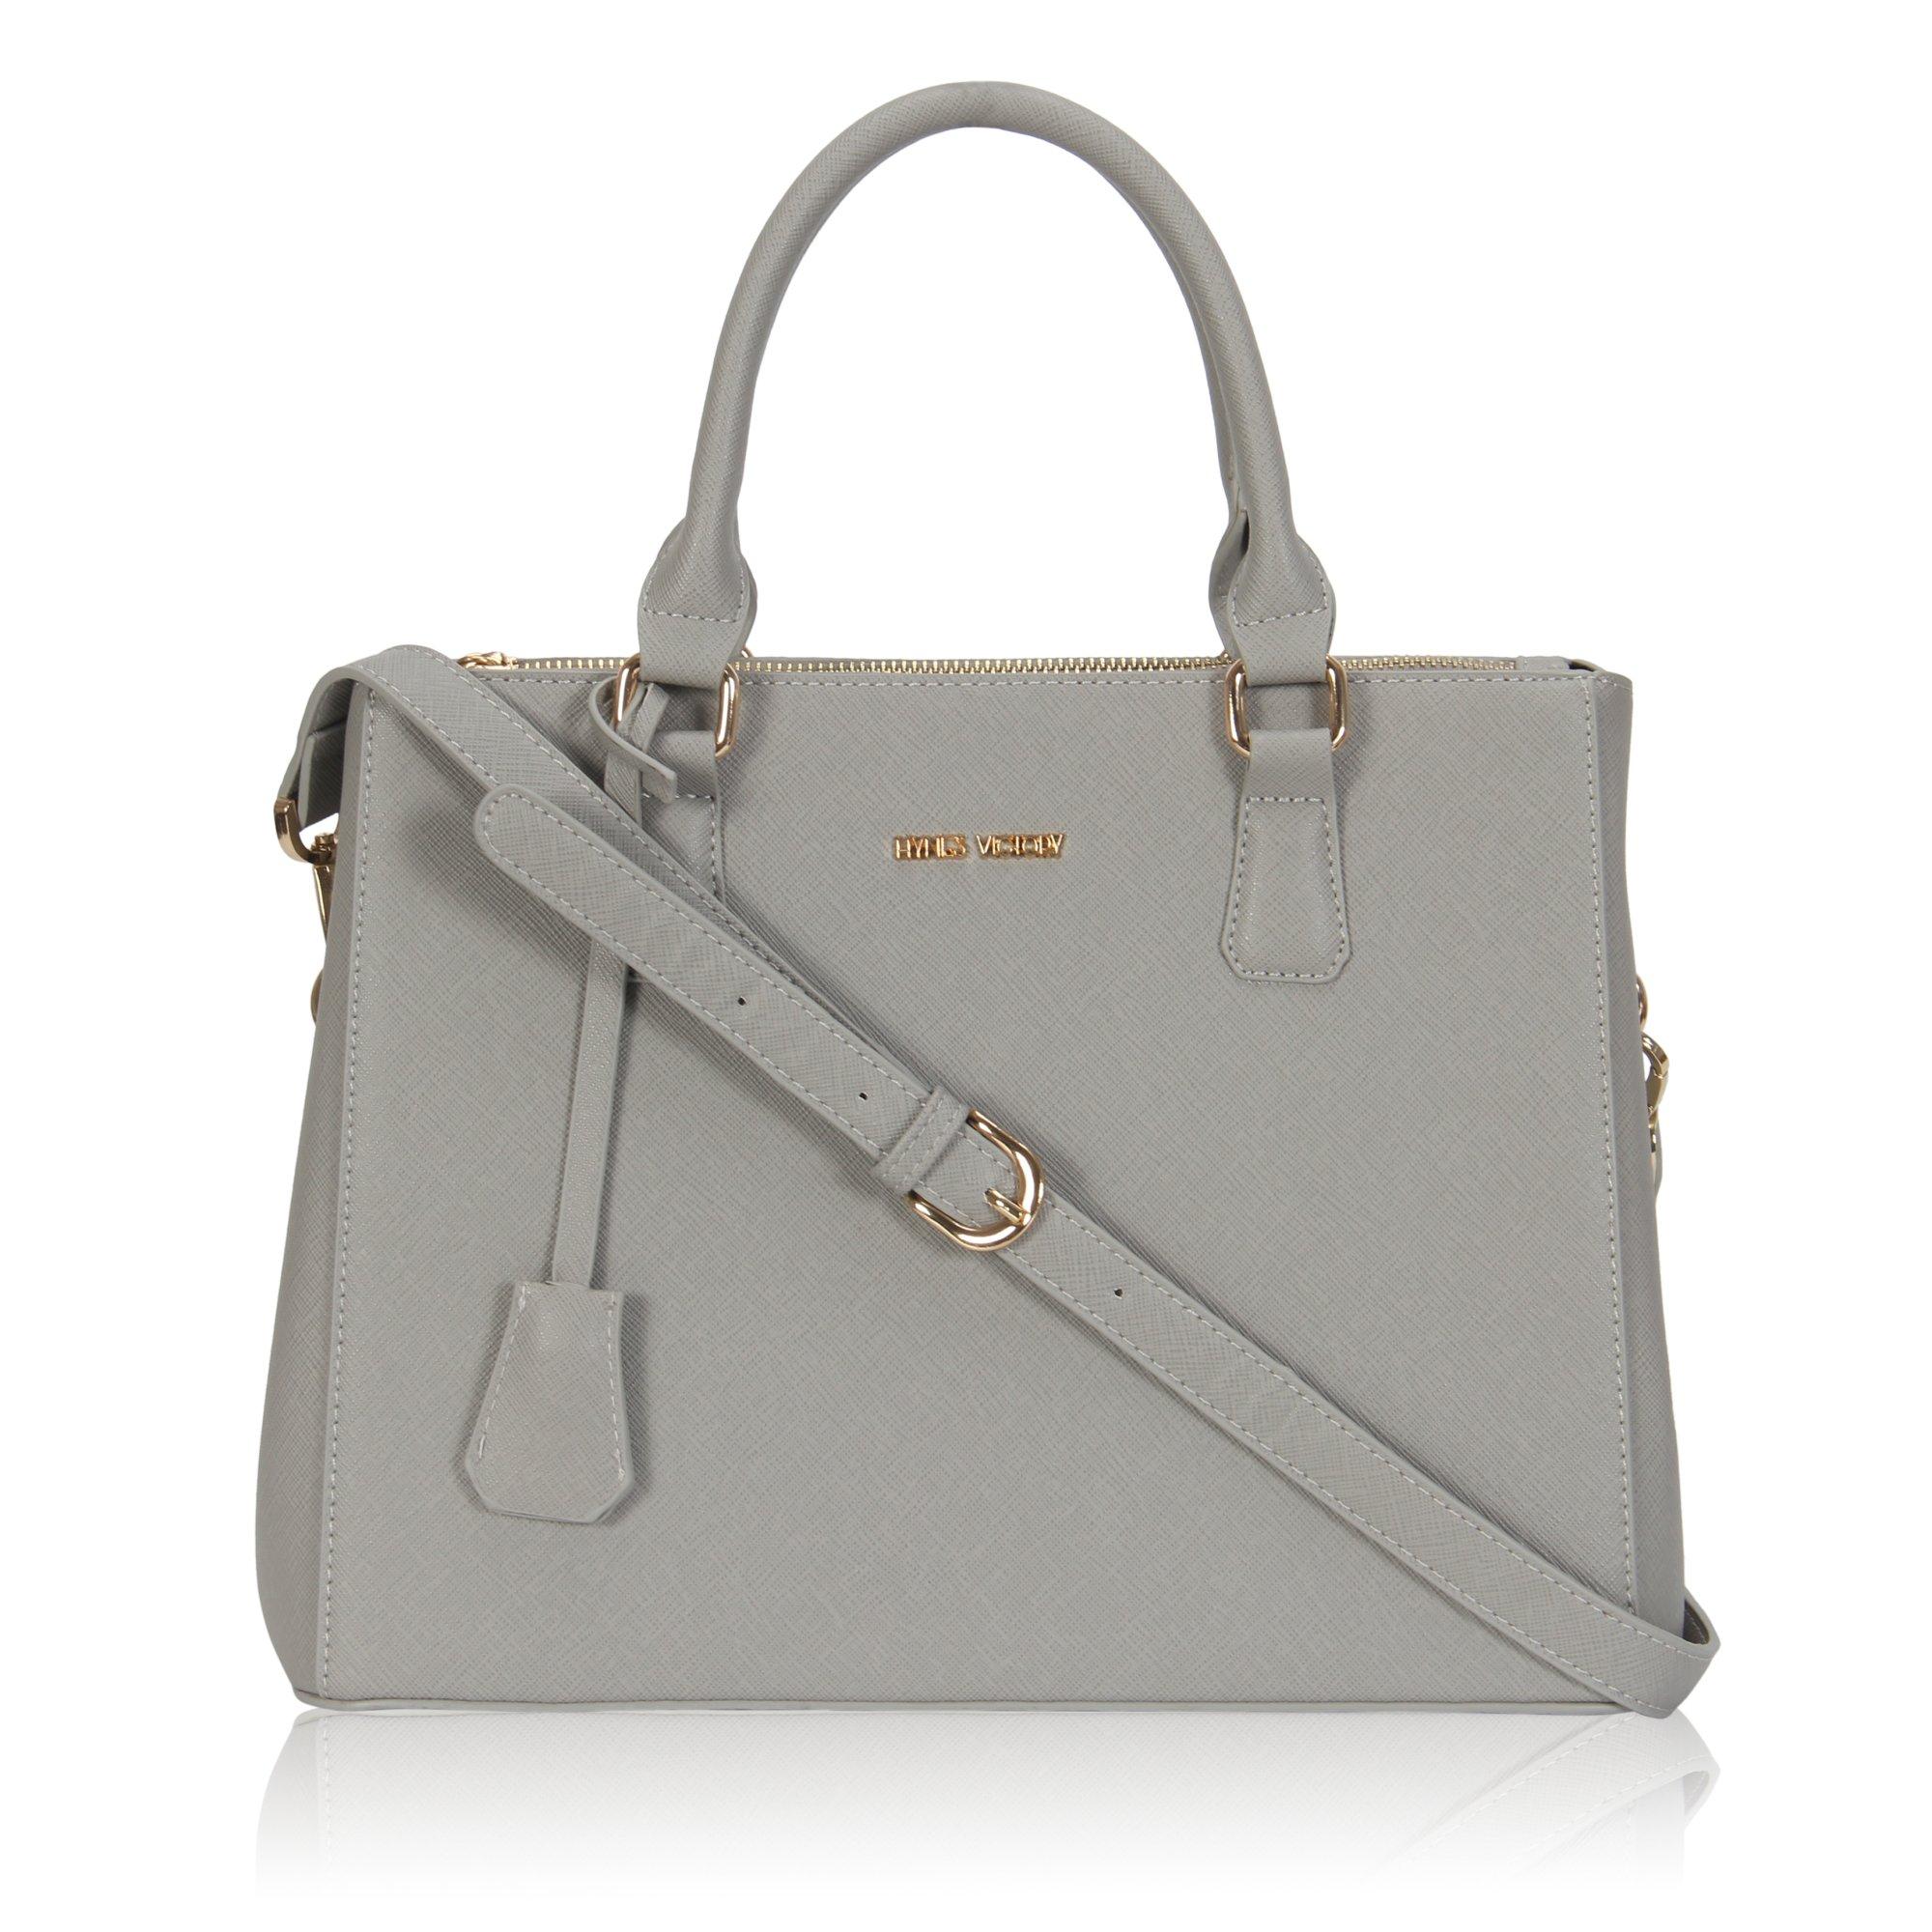 Hynes Victory Womens Classy Satchel Handbag Grey